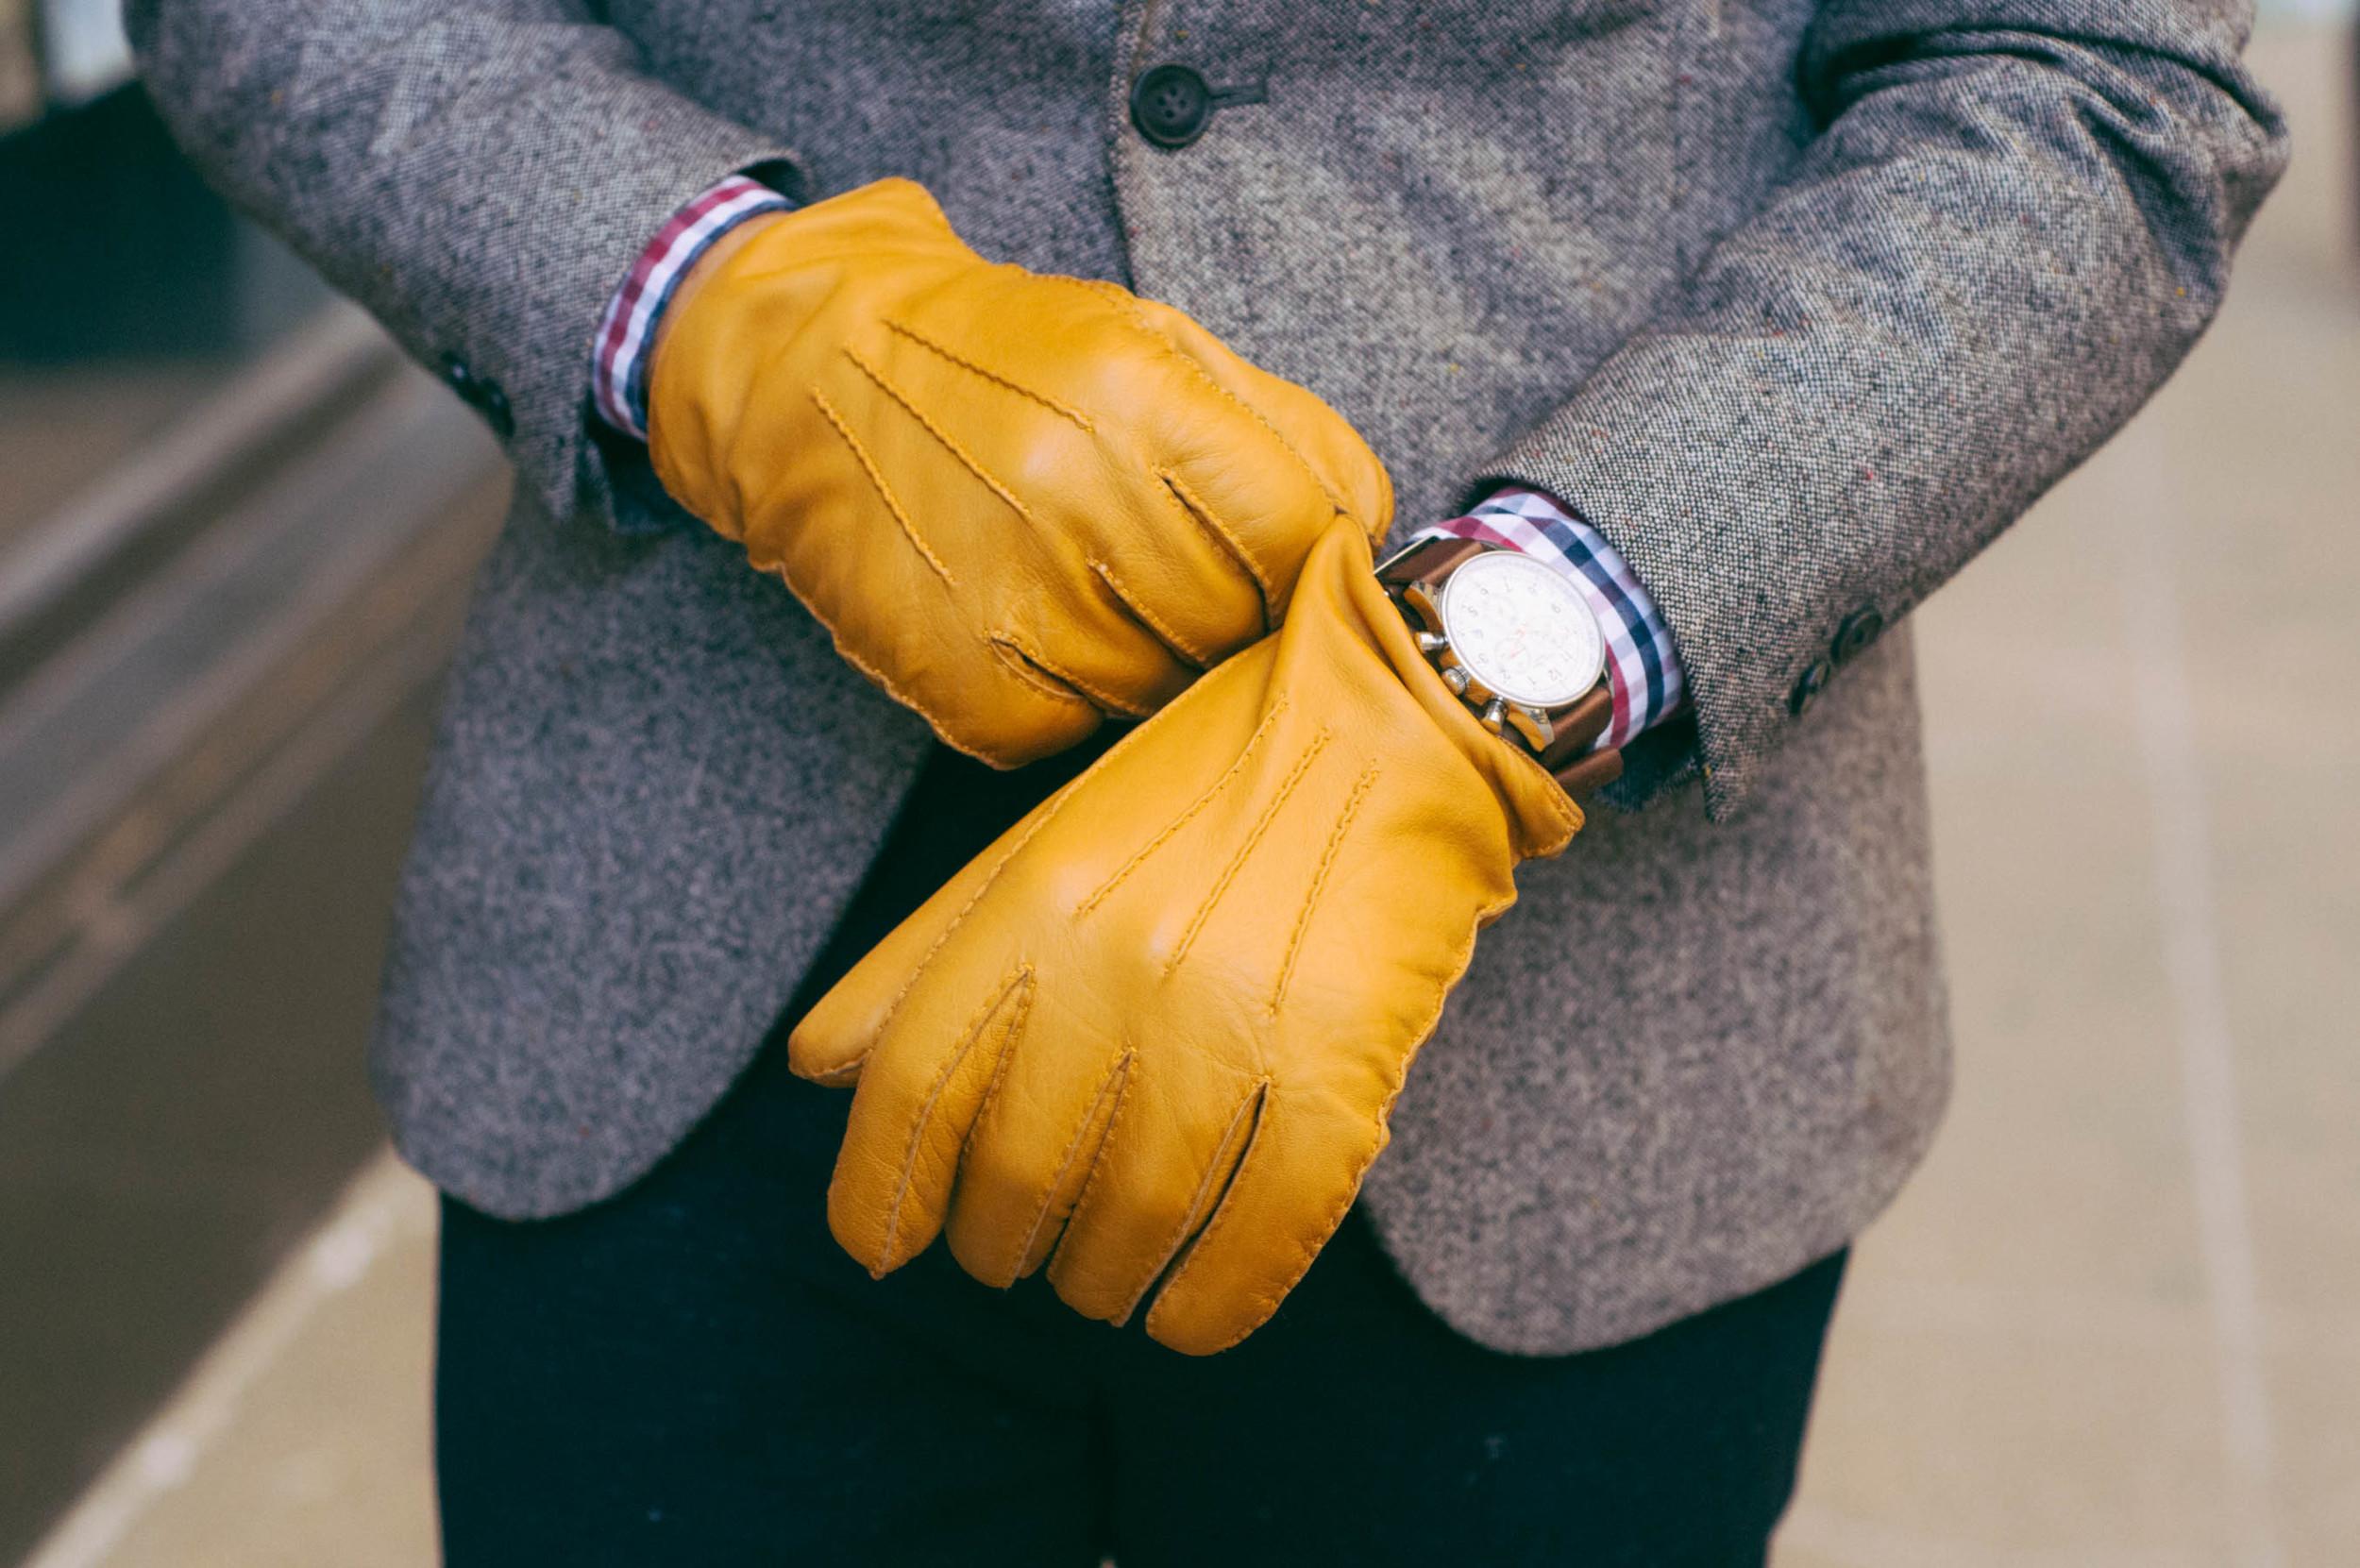 Pants &Jacket: H&M | Shirt: Merona | Tie: J.Crew | Pocket Square: The Tie Bar |Belt: J.Crew | Boots: Red Wing | Socks: J. Crew | Gloves: Jack Spade | Watch: Lucien Piccard | Glasses: Warby Parker